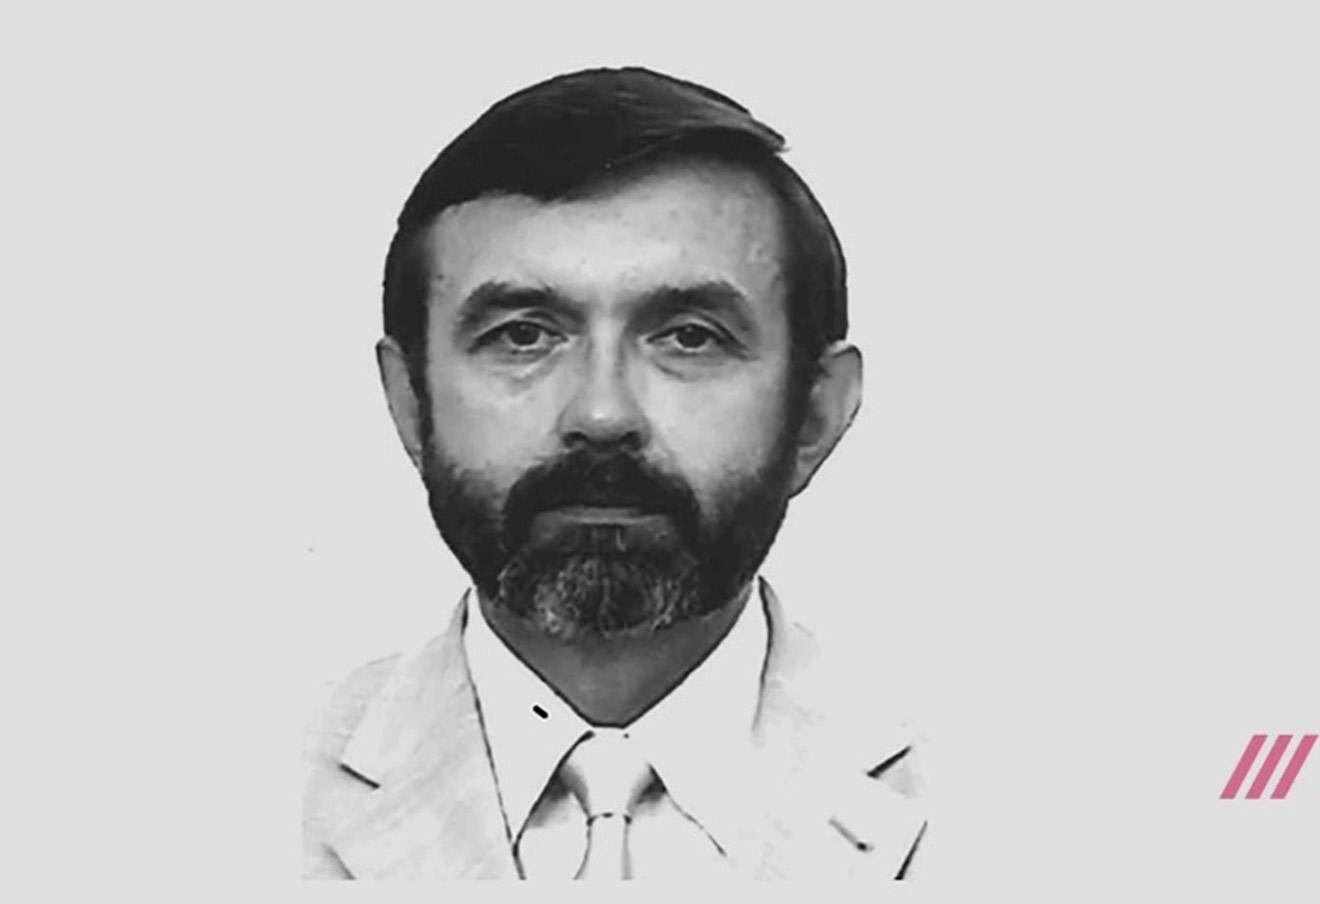 Петр Колбин. Кадр: tvrain.ru